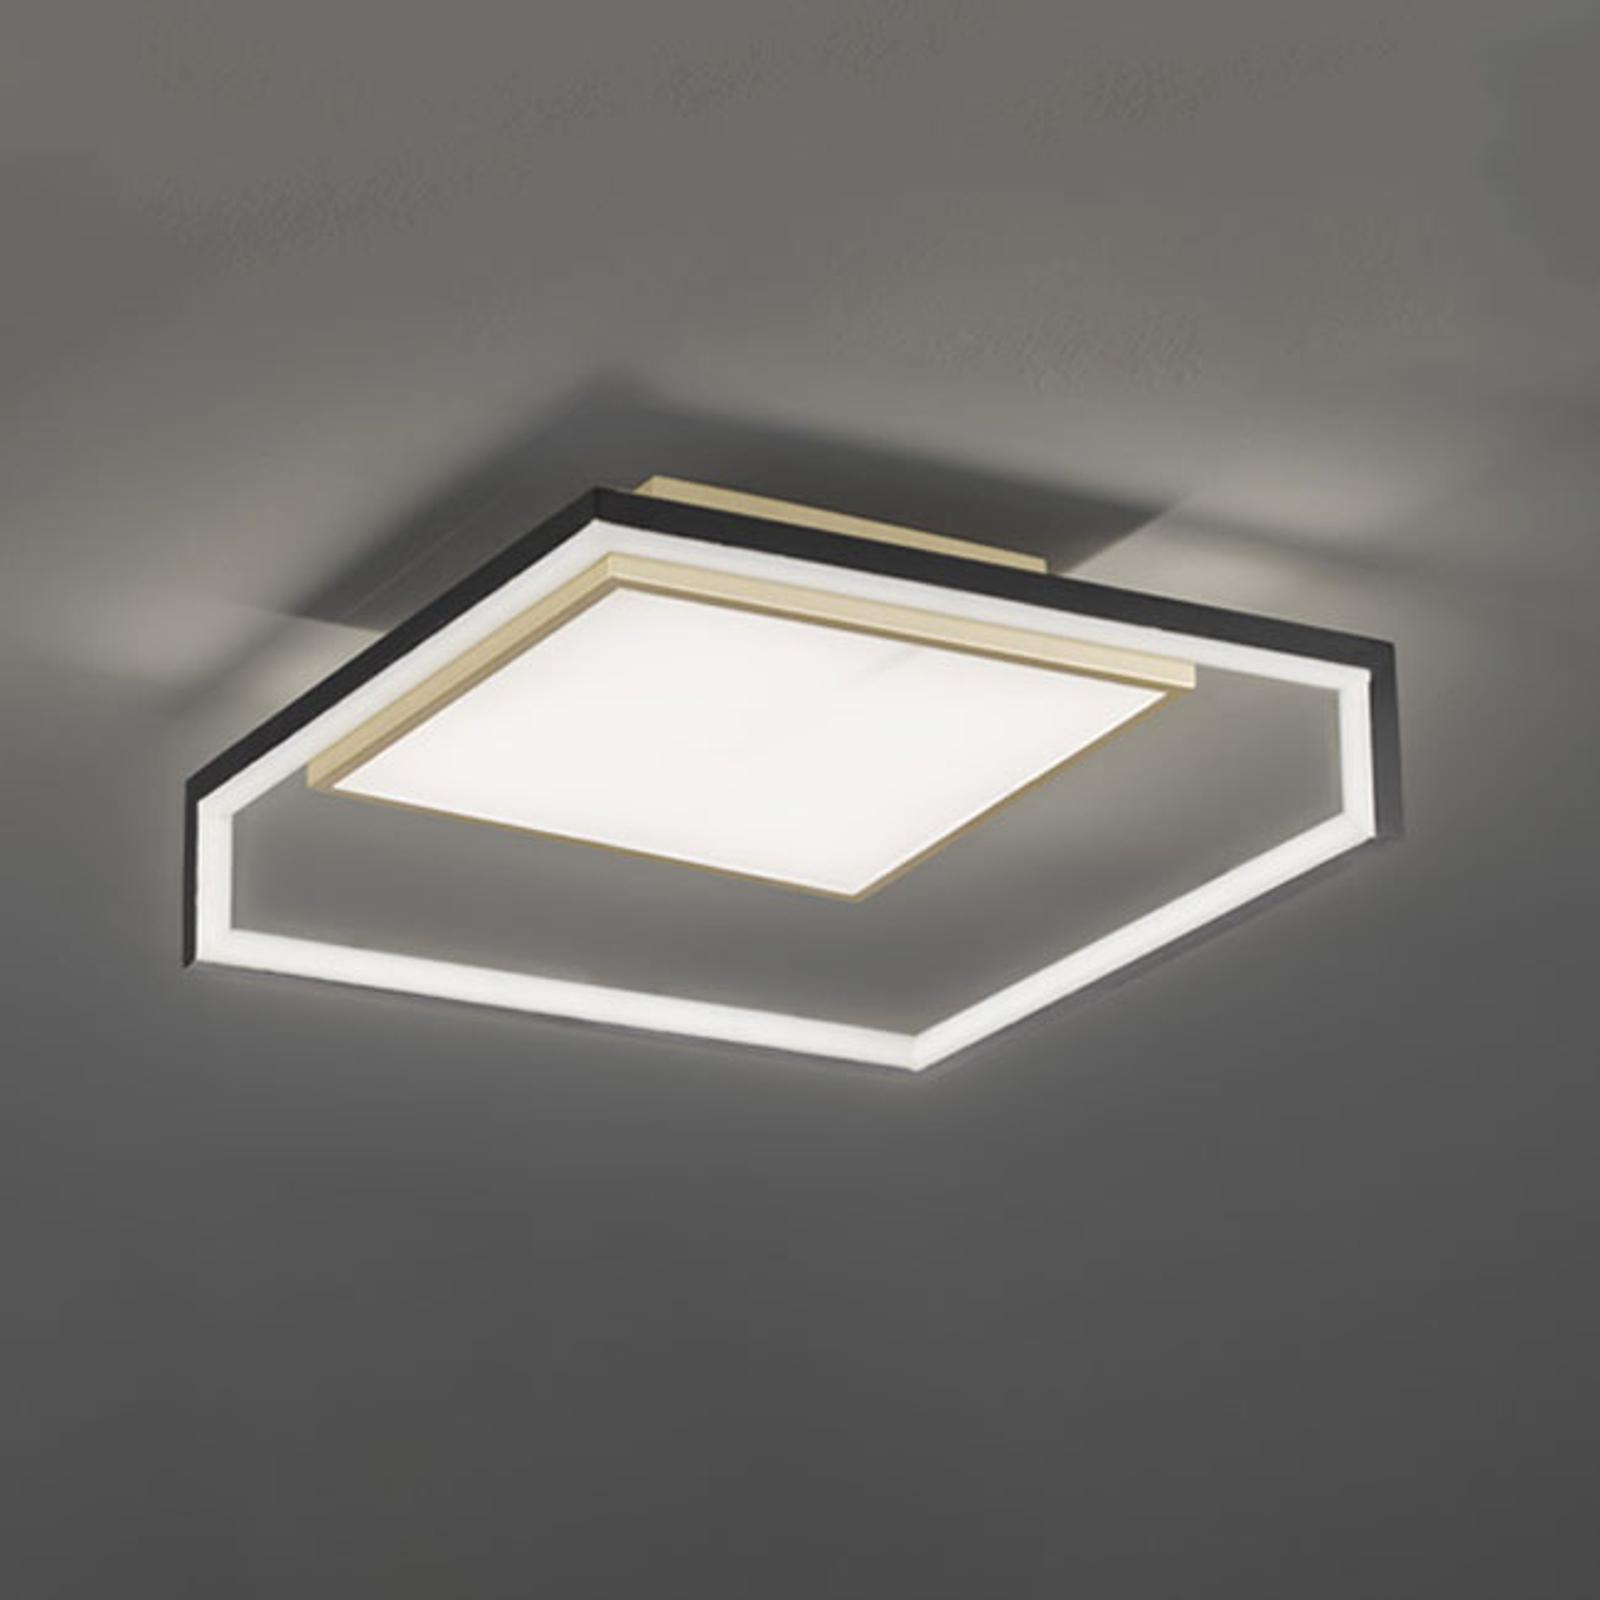 LED-taklampe Nala i moderne design